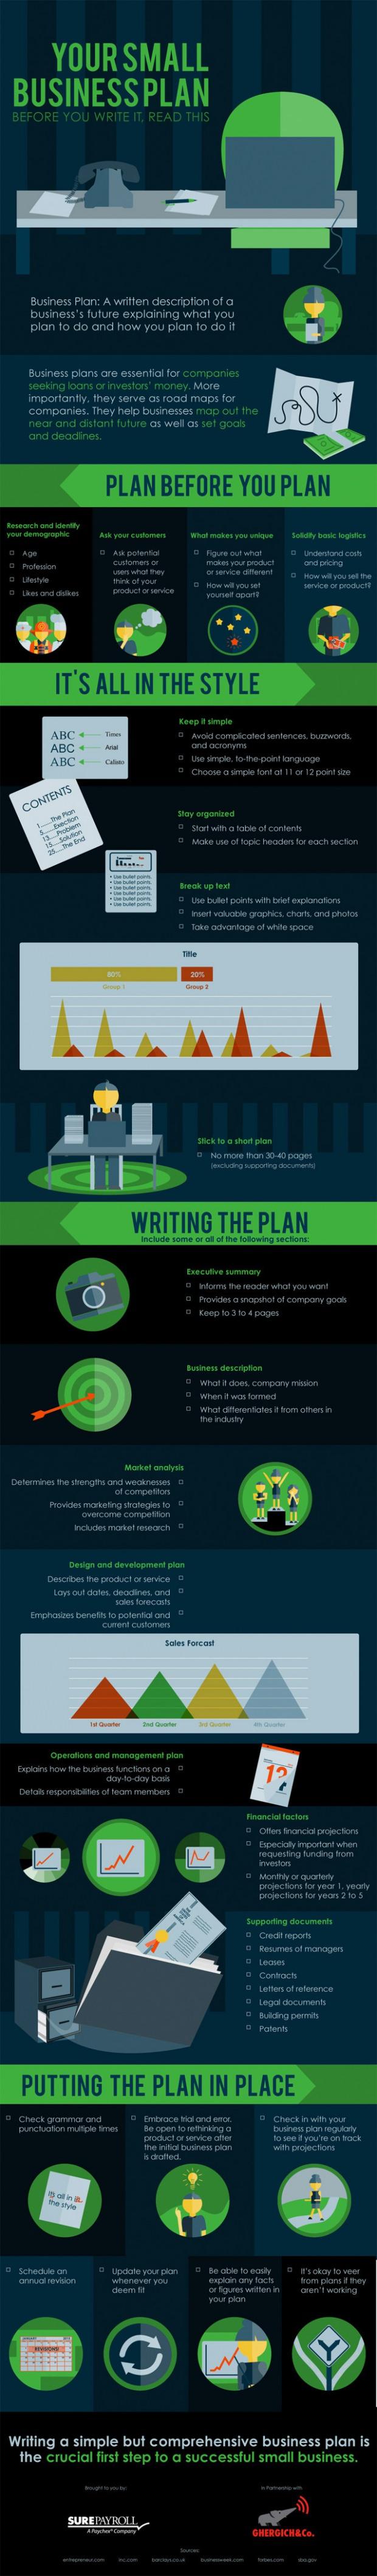 infographie-ecrire-business-plan